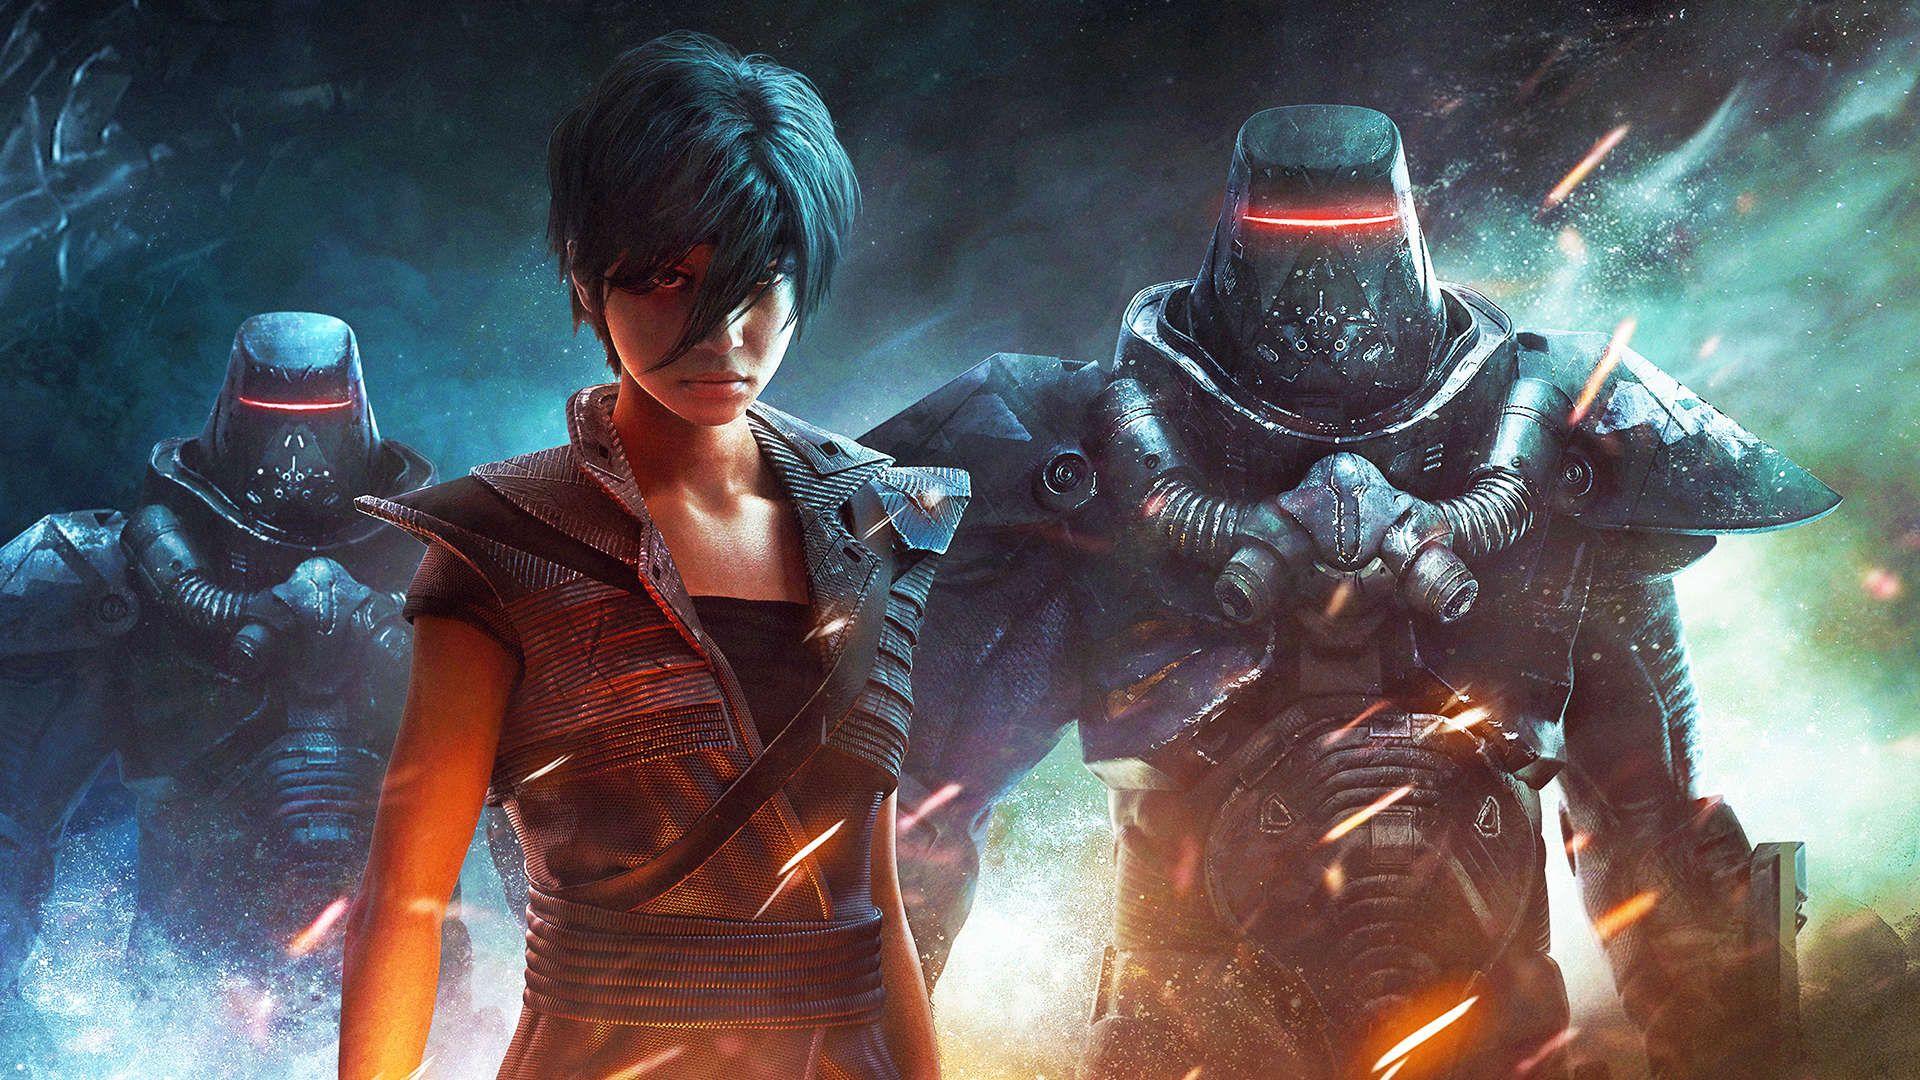 E3 2018 Beyond Good Evil 2 S Gameplay Explained Beyond Good